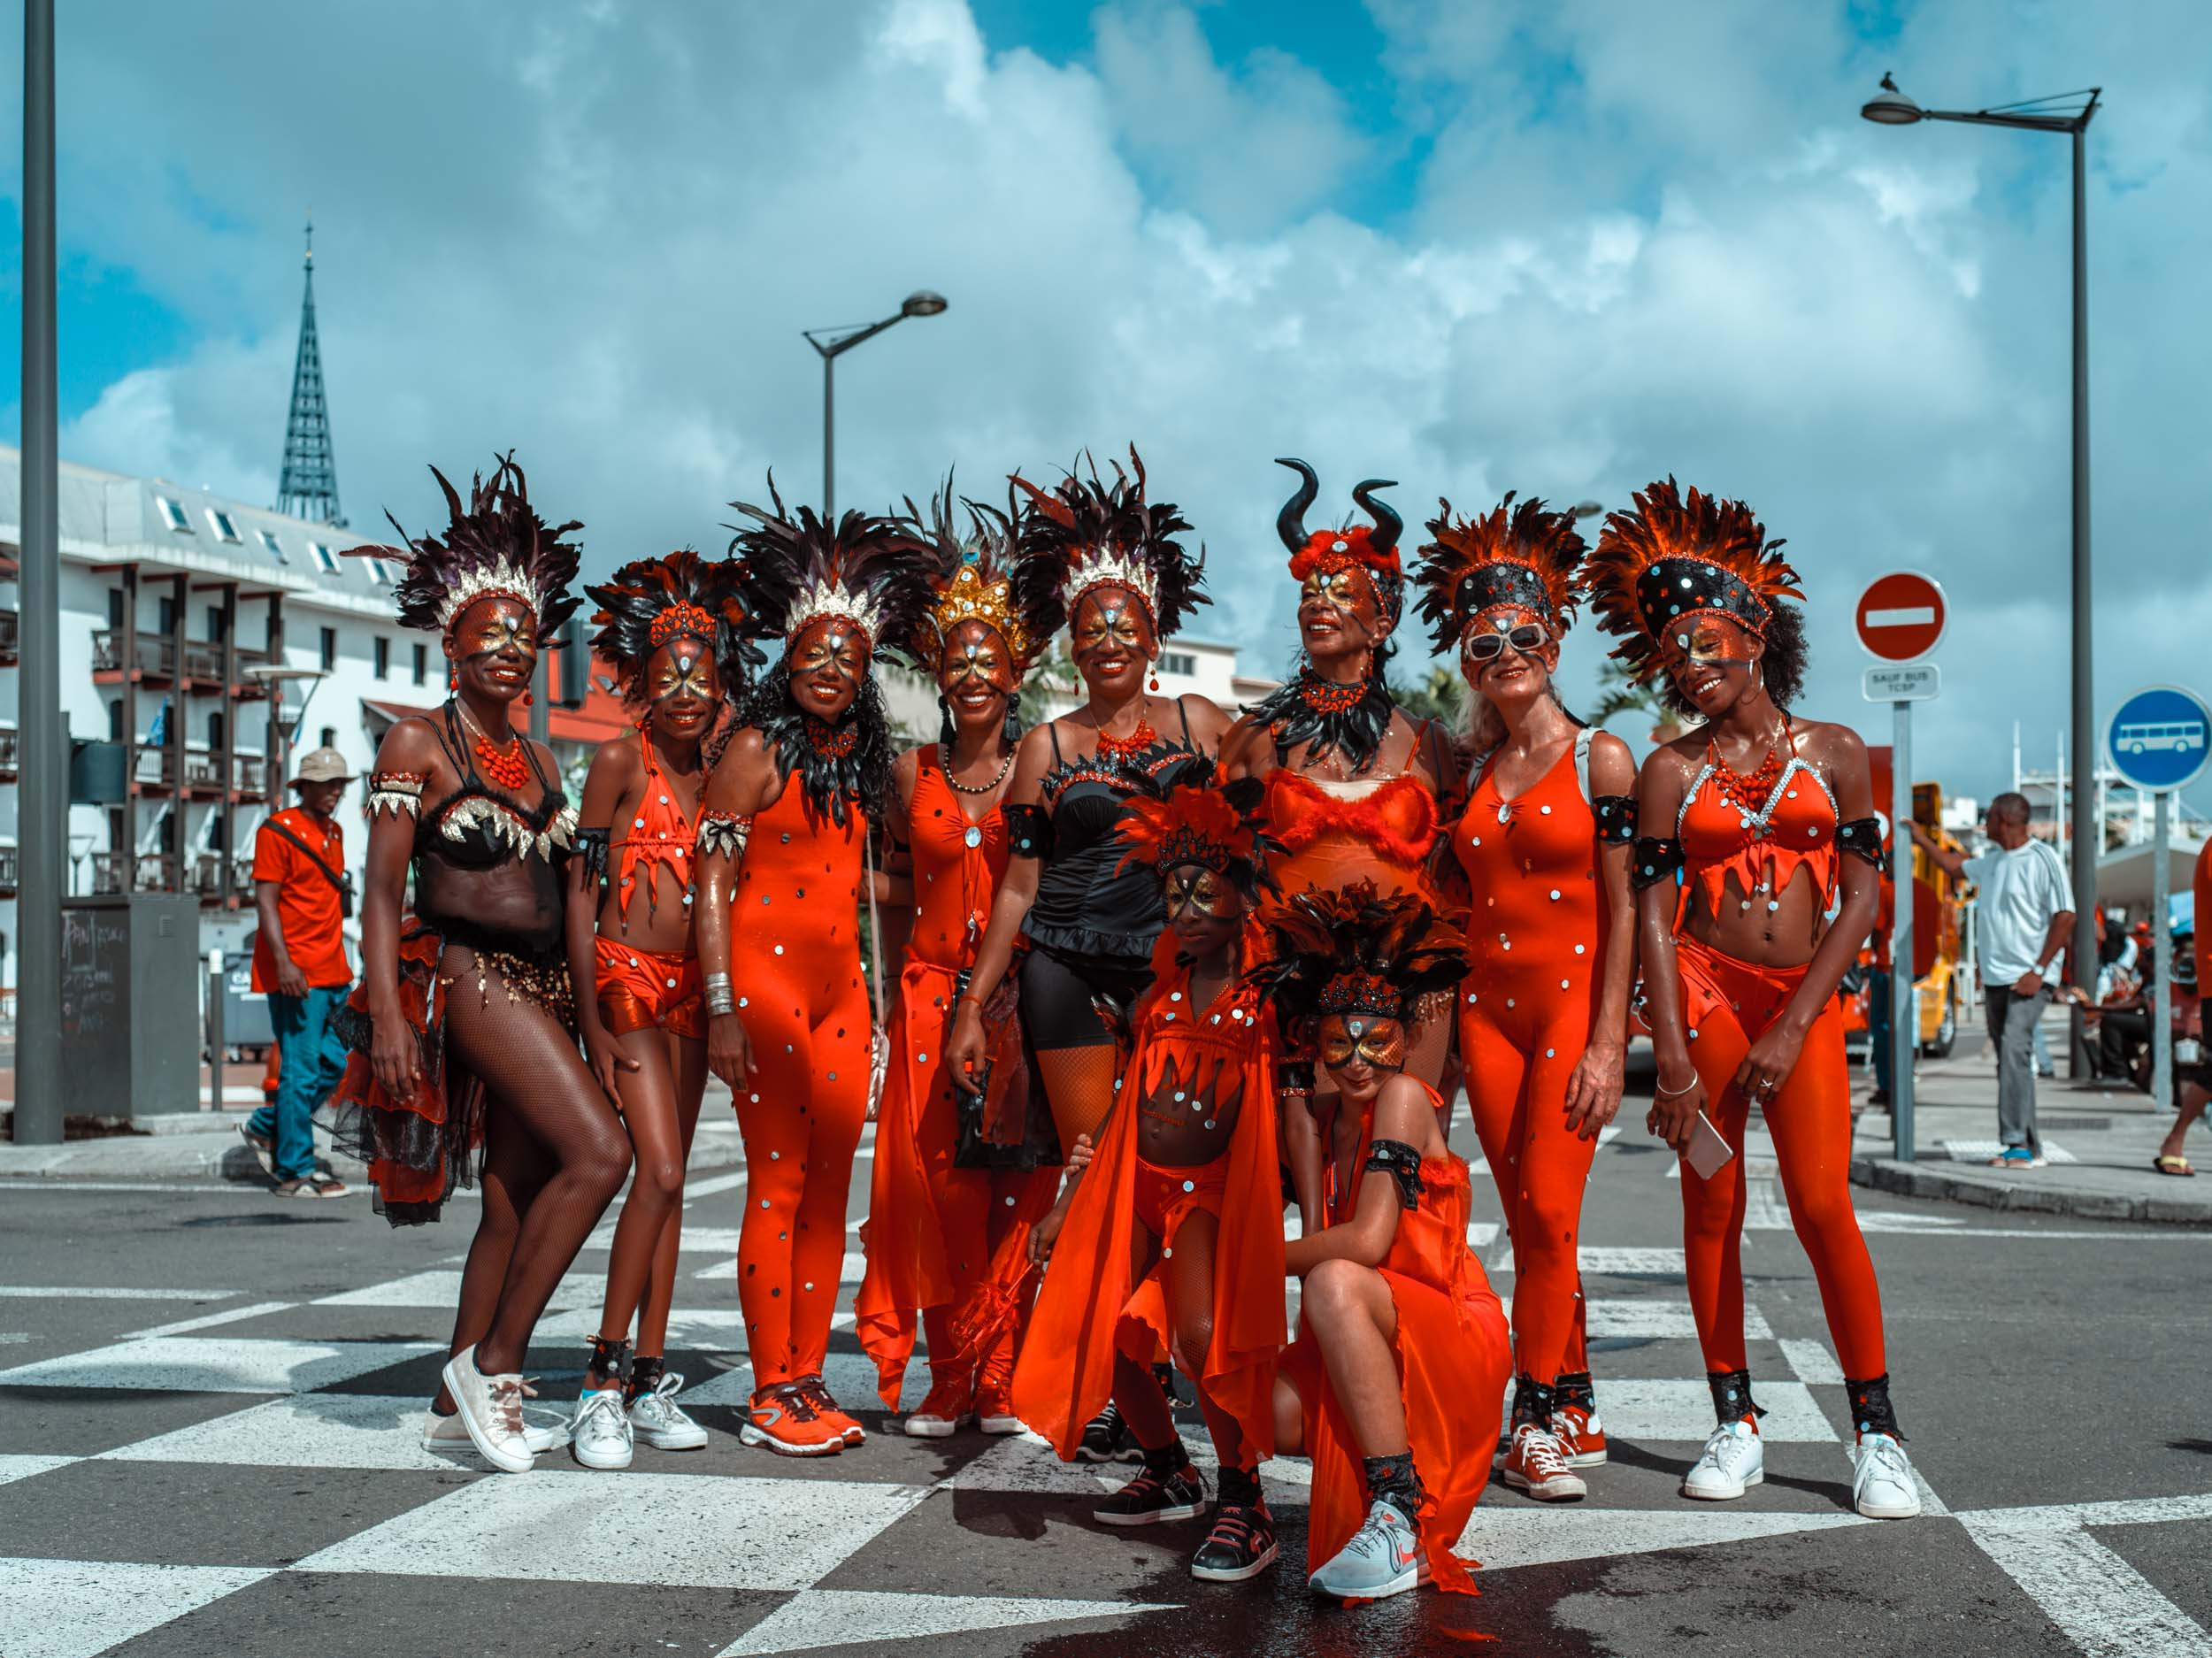 180213_SK_Martinique-13.jpg